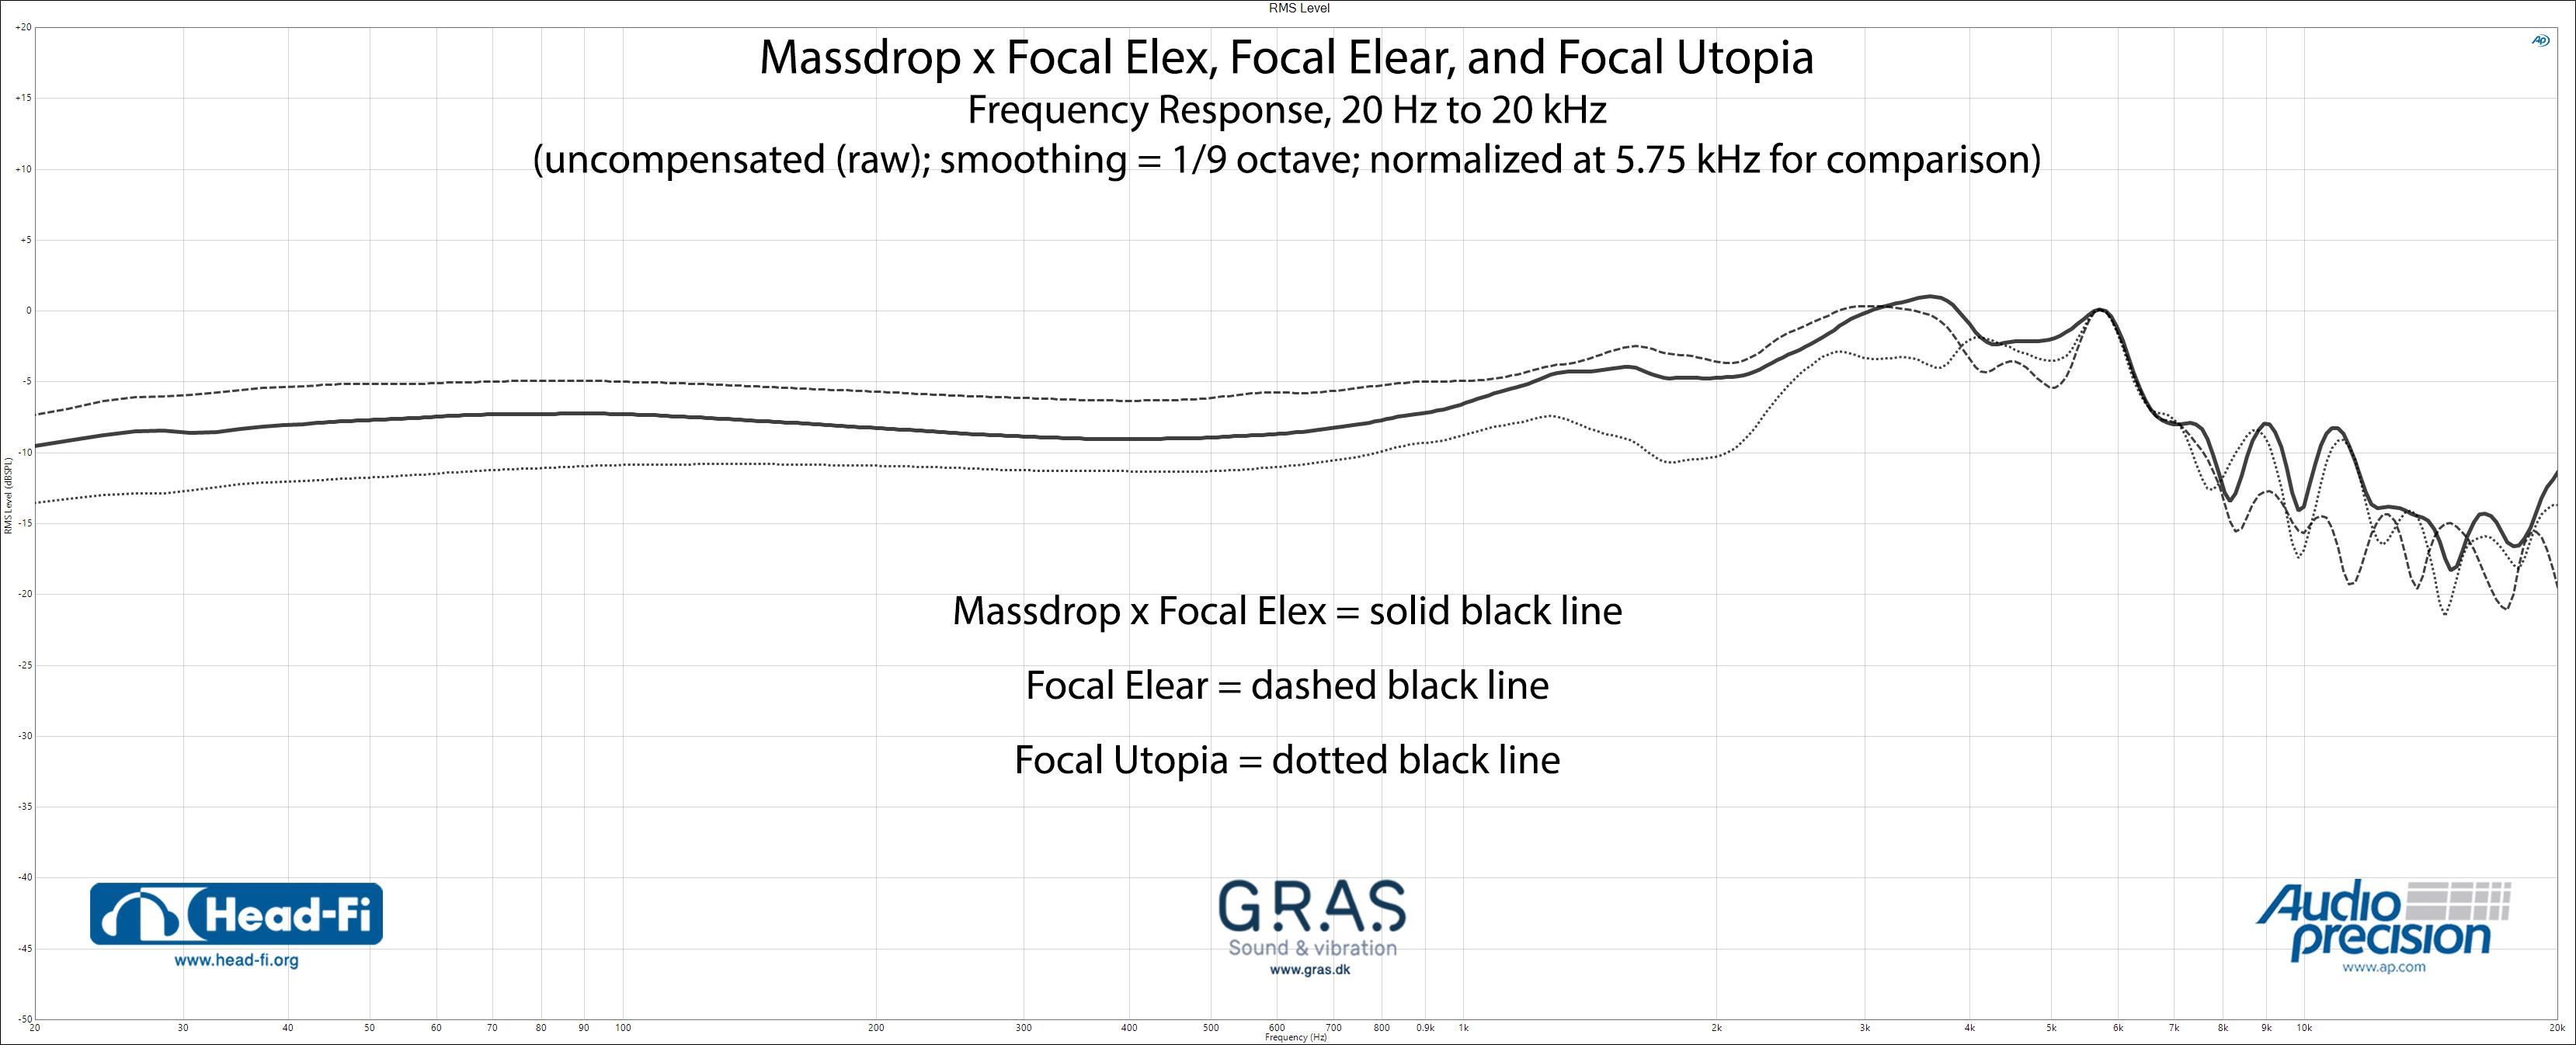 RMS-Level_1-9_RAW_Normalize-5.75-kHz_Massdrop-x-Focal-Elex_Focal-Elear_Focal-Utopia.jpg